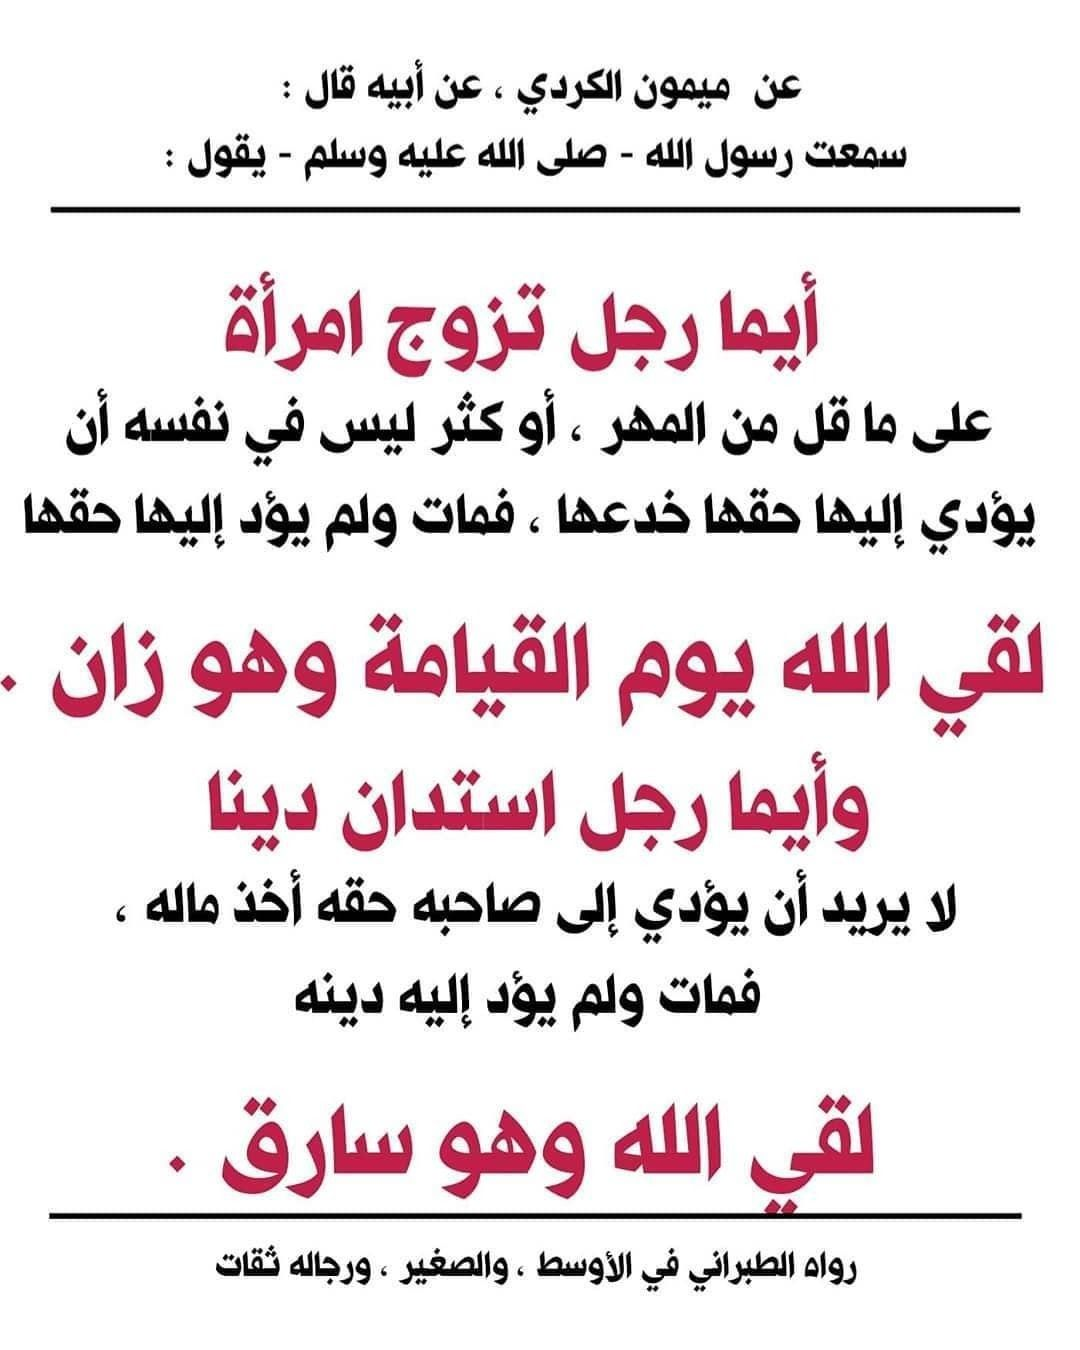 Pin By عبق الورد On أحاديث نبوية ١ Islamic Quotes Quran Quotes Islamic Quotes